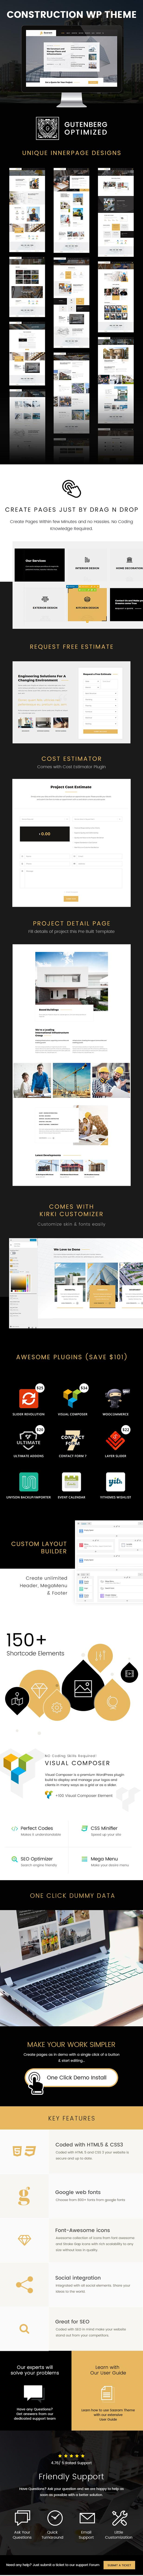 Saaram Construction, Architect WordPress Theme - 1